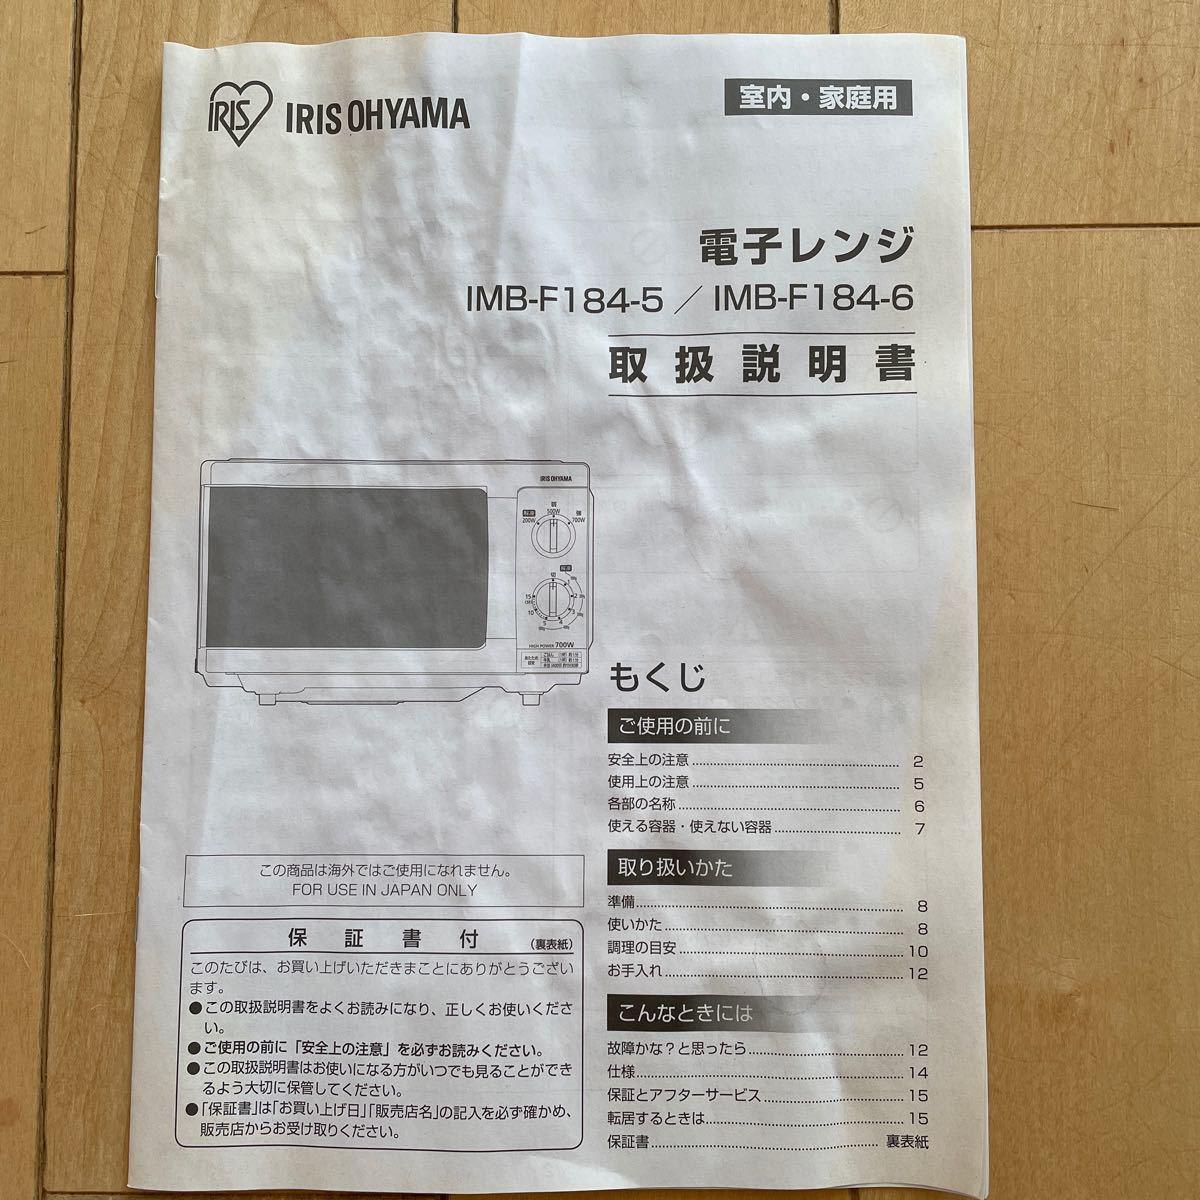 IRIS OHYAMA 電子レンジ IMB-F184-6